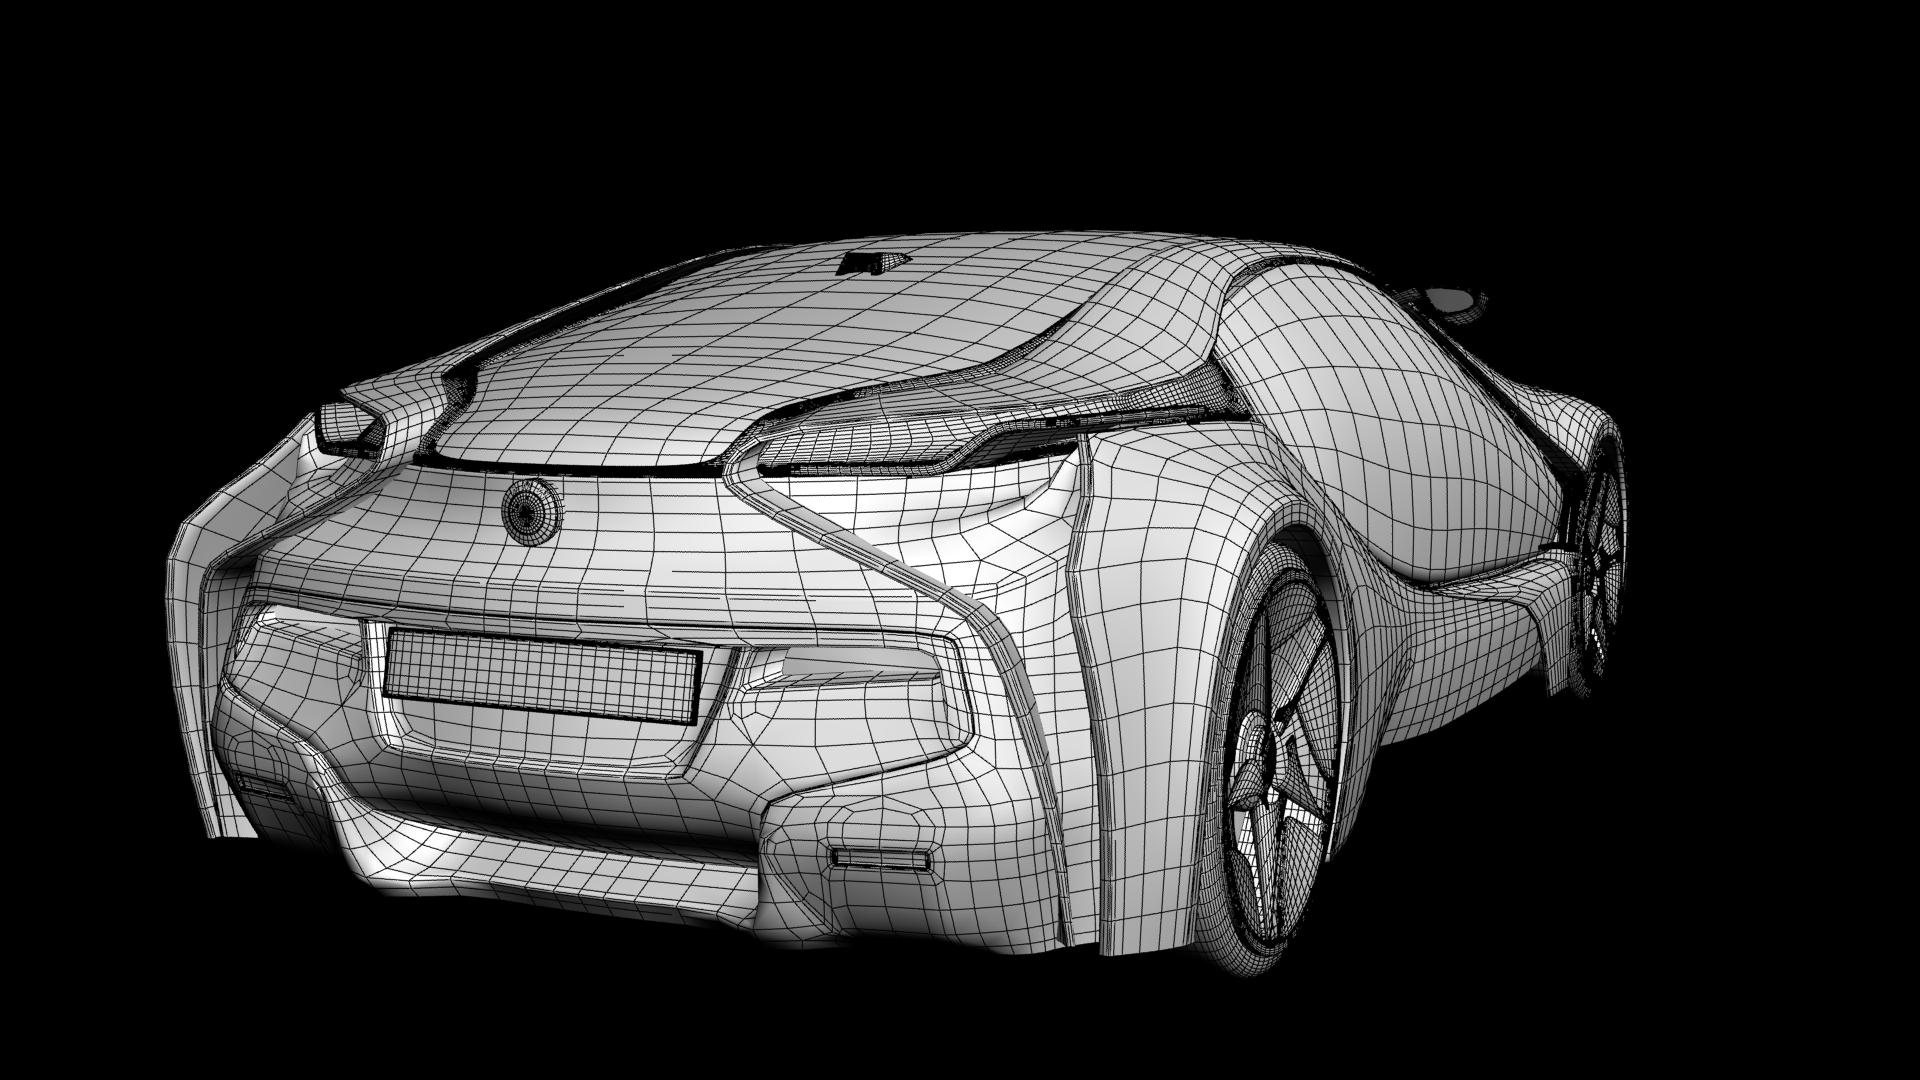 Bmw Efficientdynamics 3d Model Max Obj Cgtrader Com